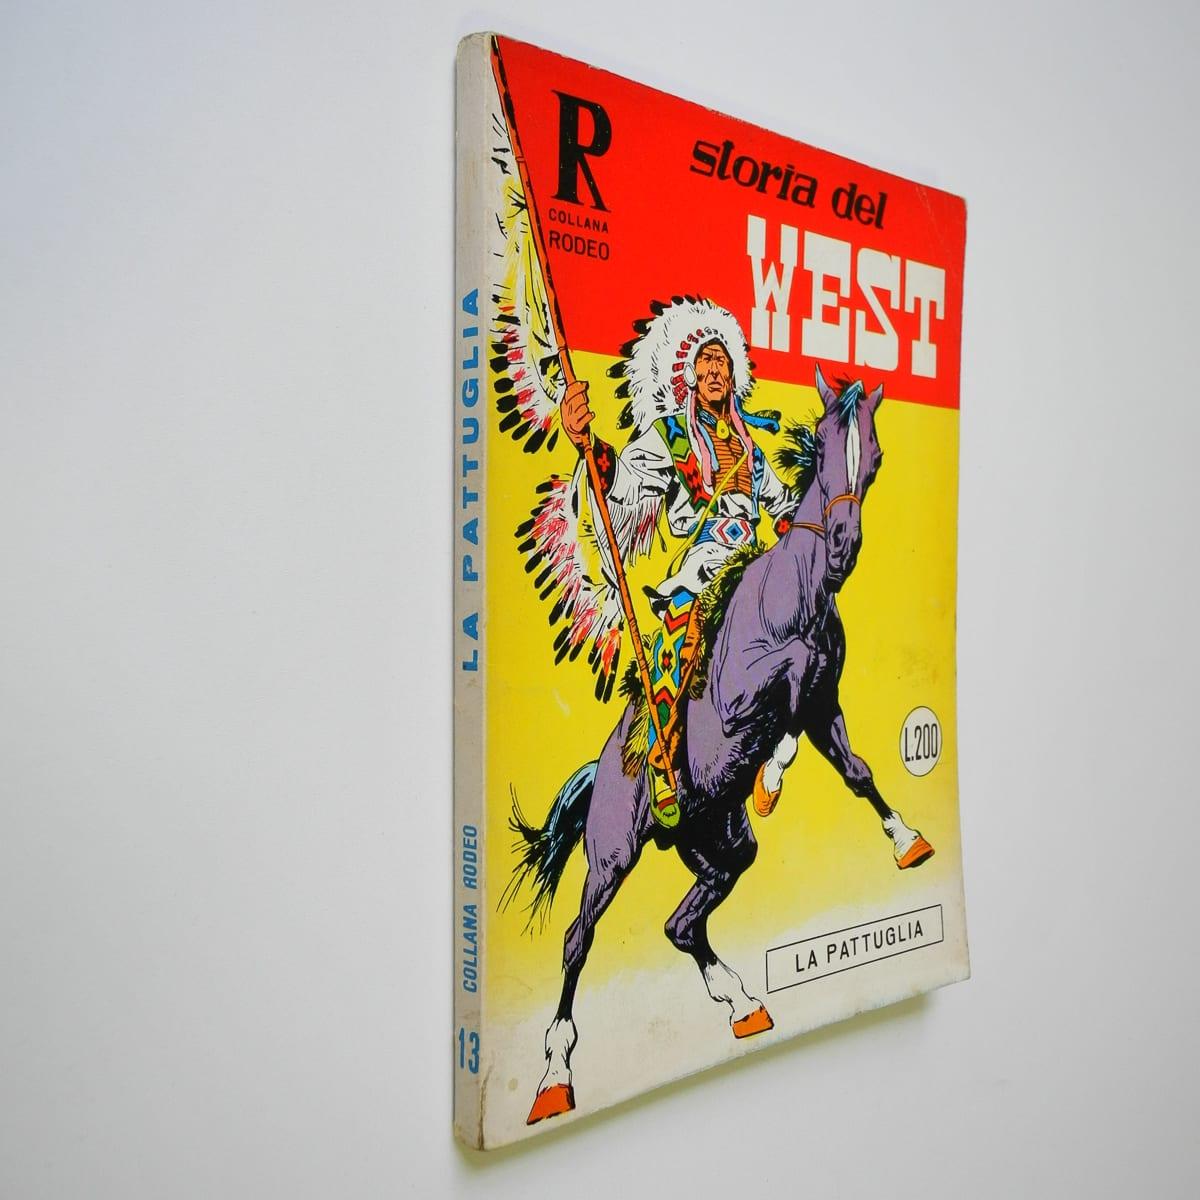 Collana Rodeo n. 13 Storia del West Bonelli